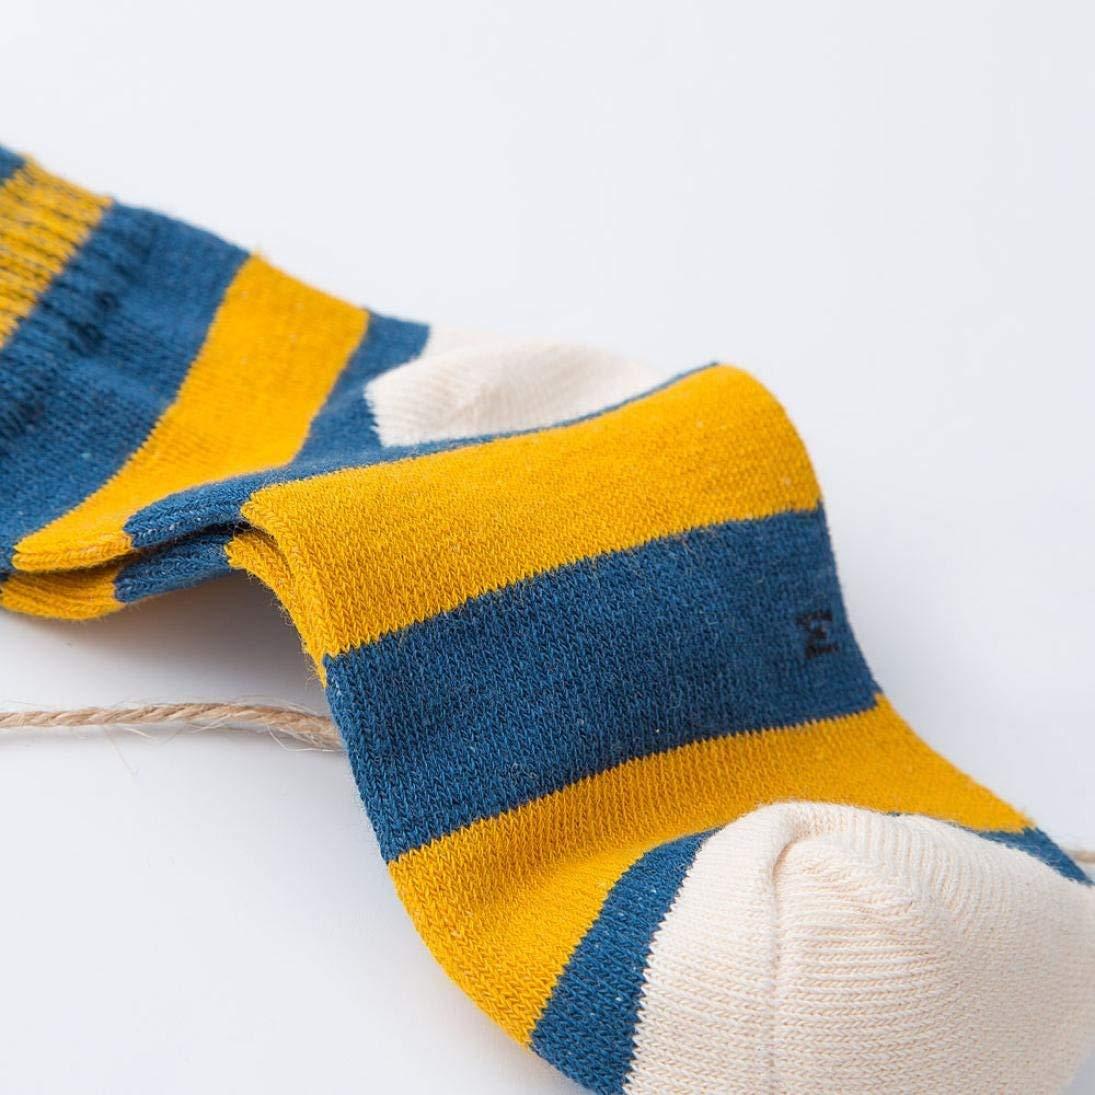 Black /& White EUYOUZI 5 Pairs Super Sales Baby Boys Girls Knitting Cotton Infant Kids Socks